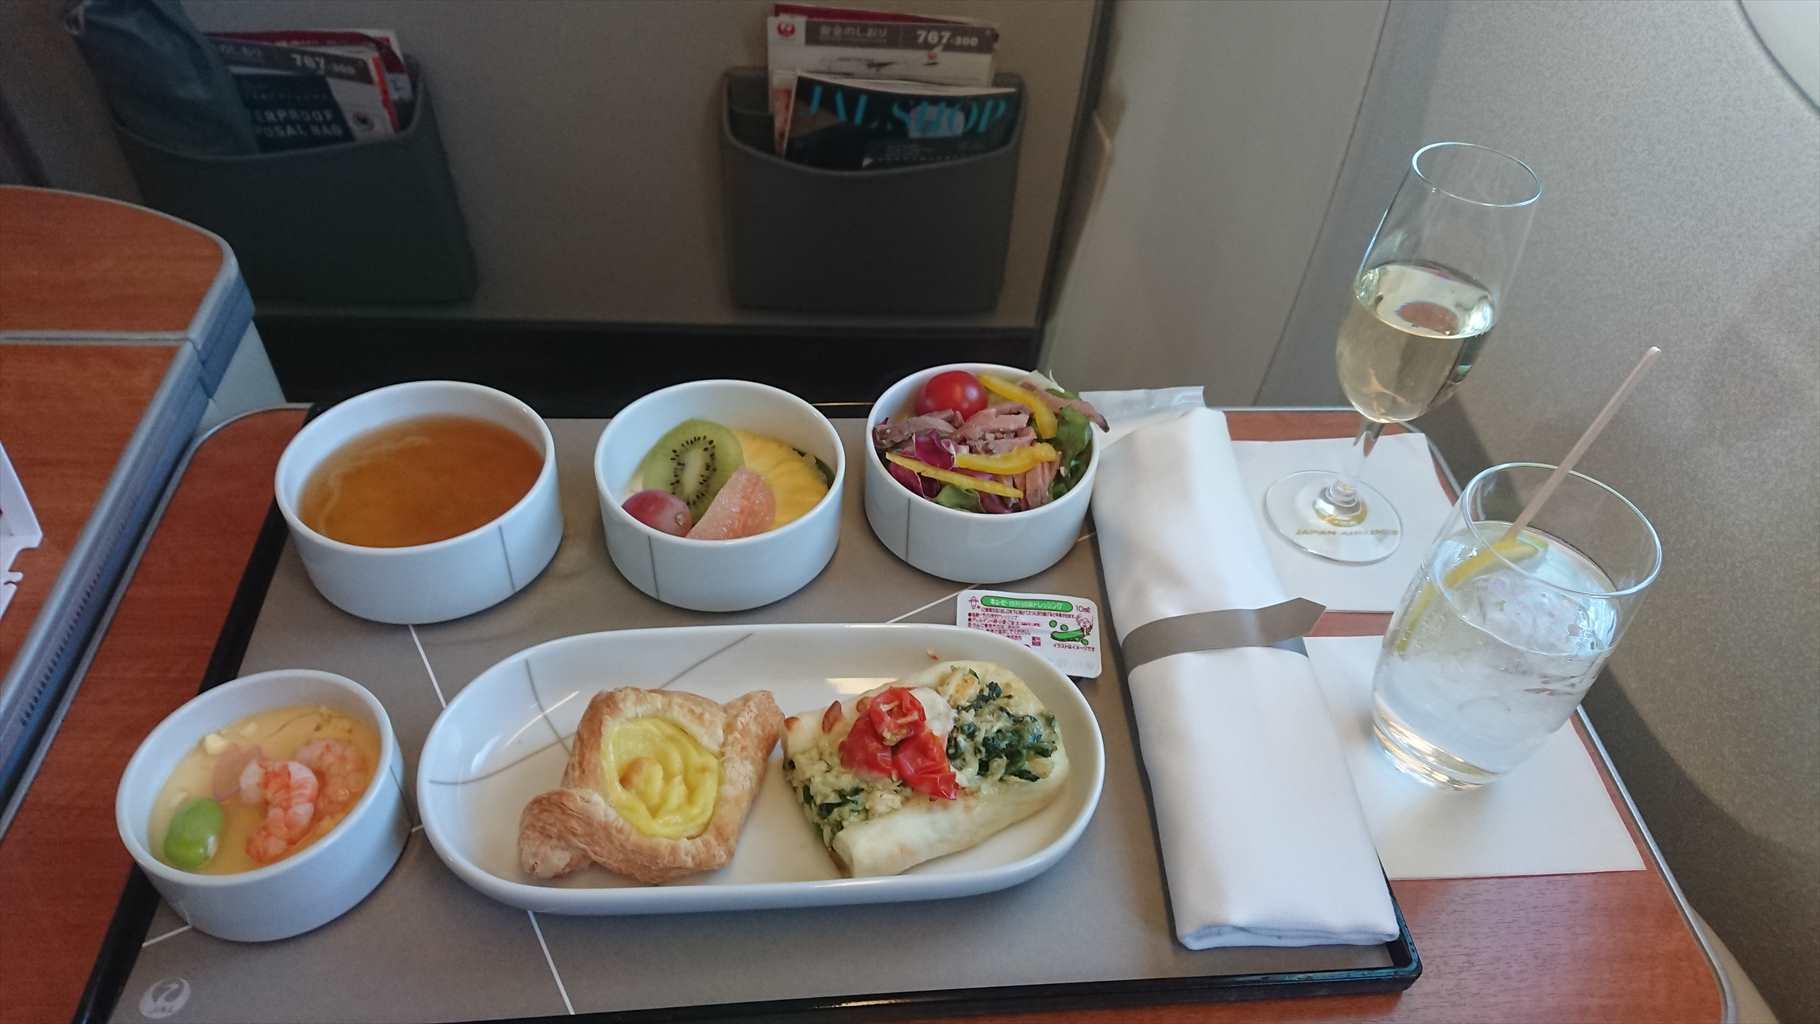 09MAR20 JL907 羽田-那覇 ファーストクラス 機内食